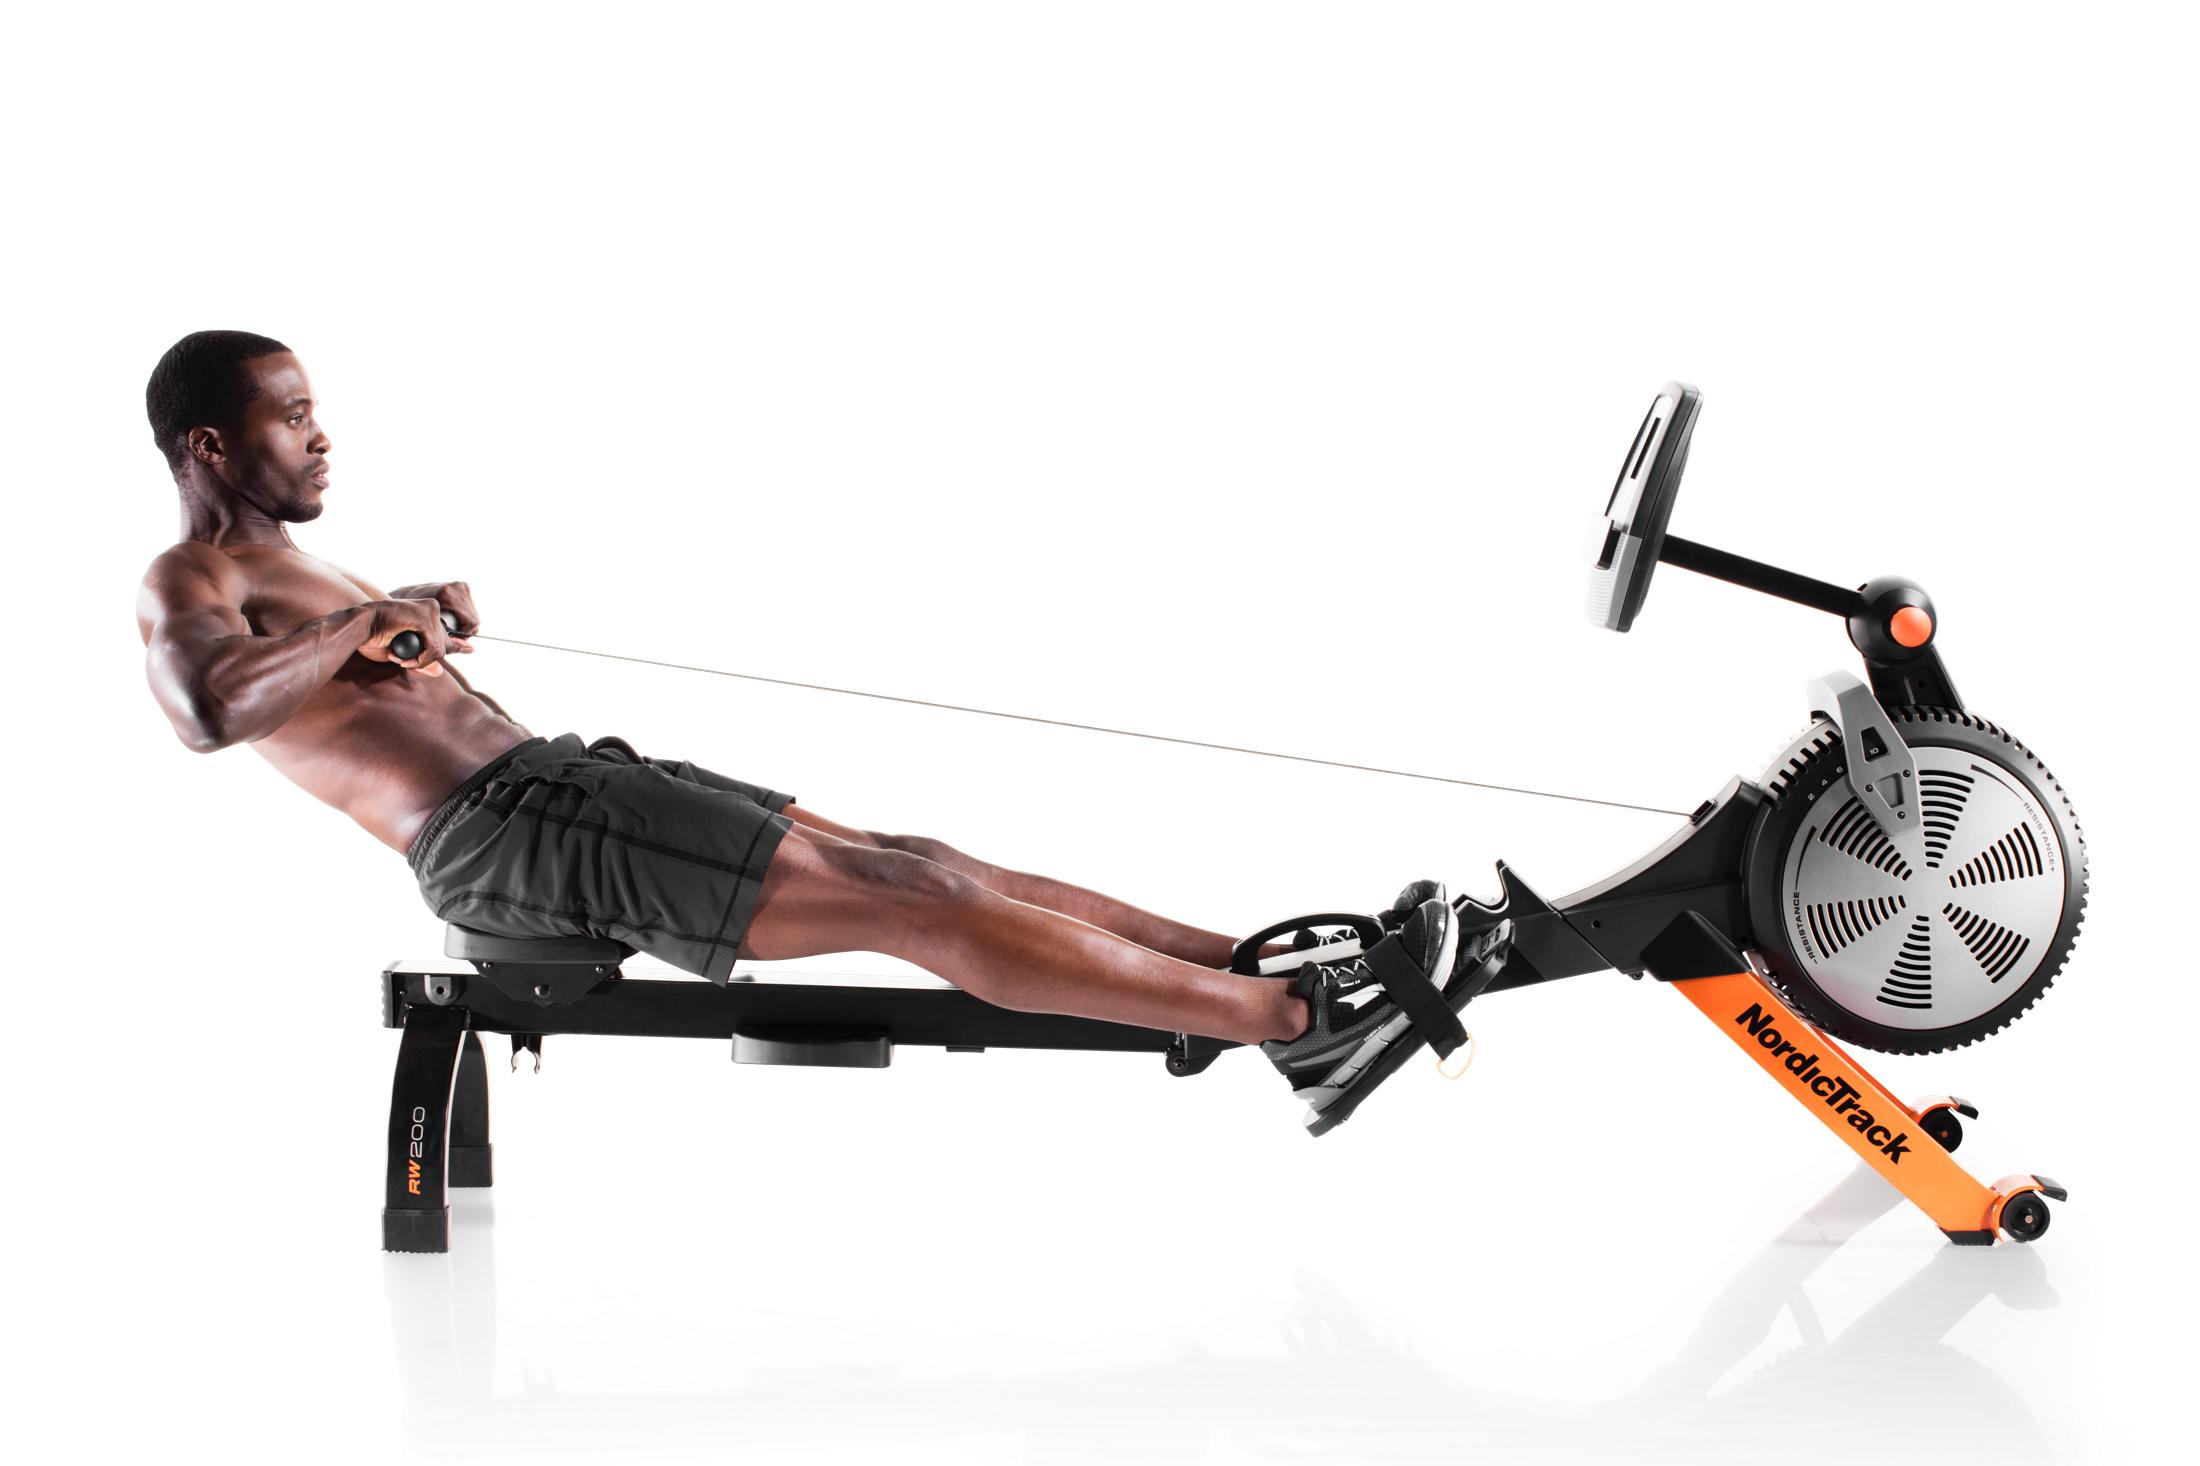 NordicTrack RW200 Rower gallery image 4